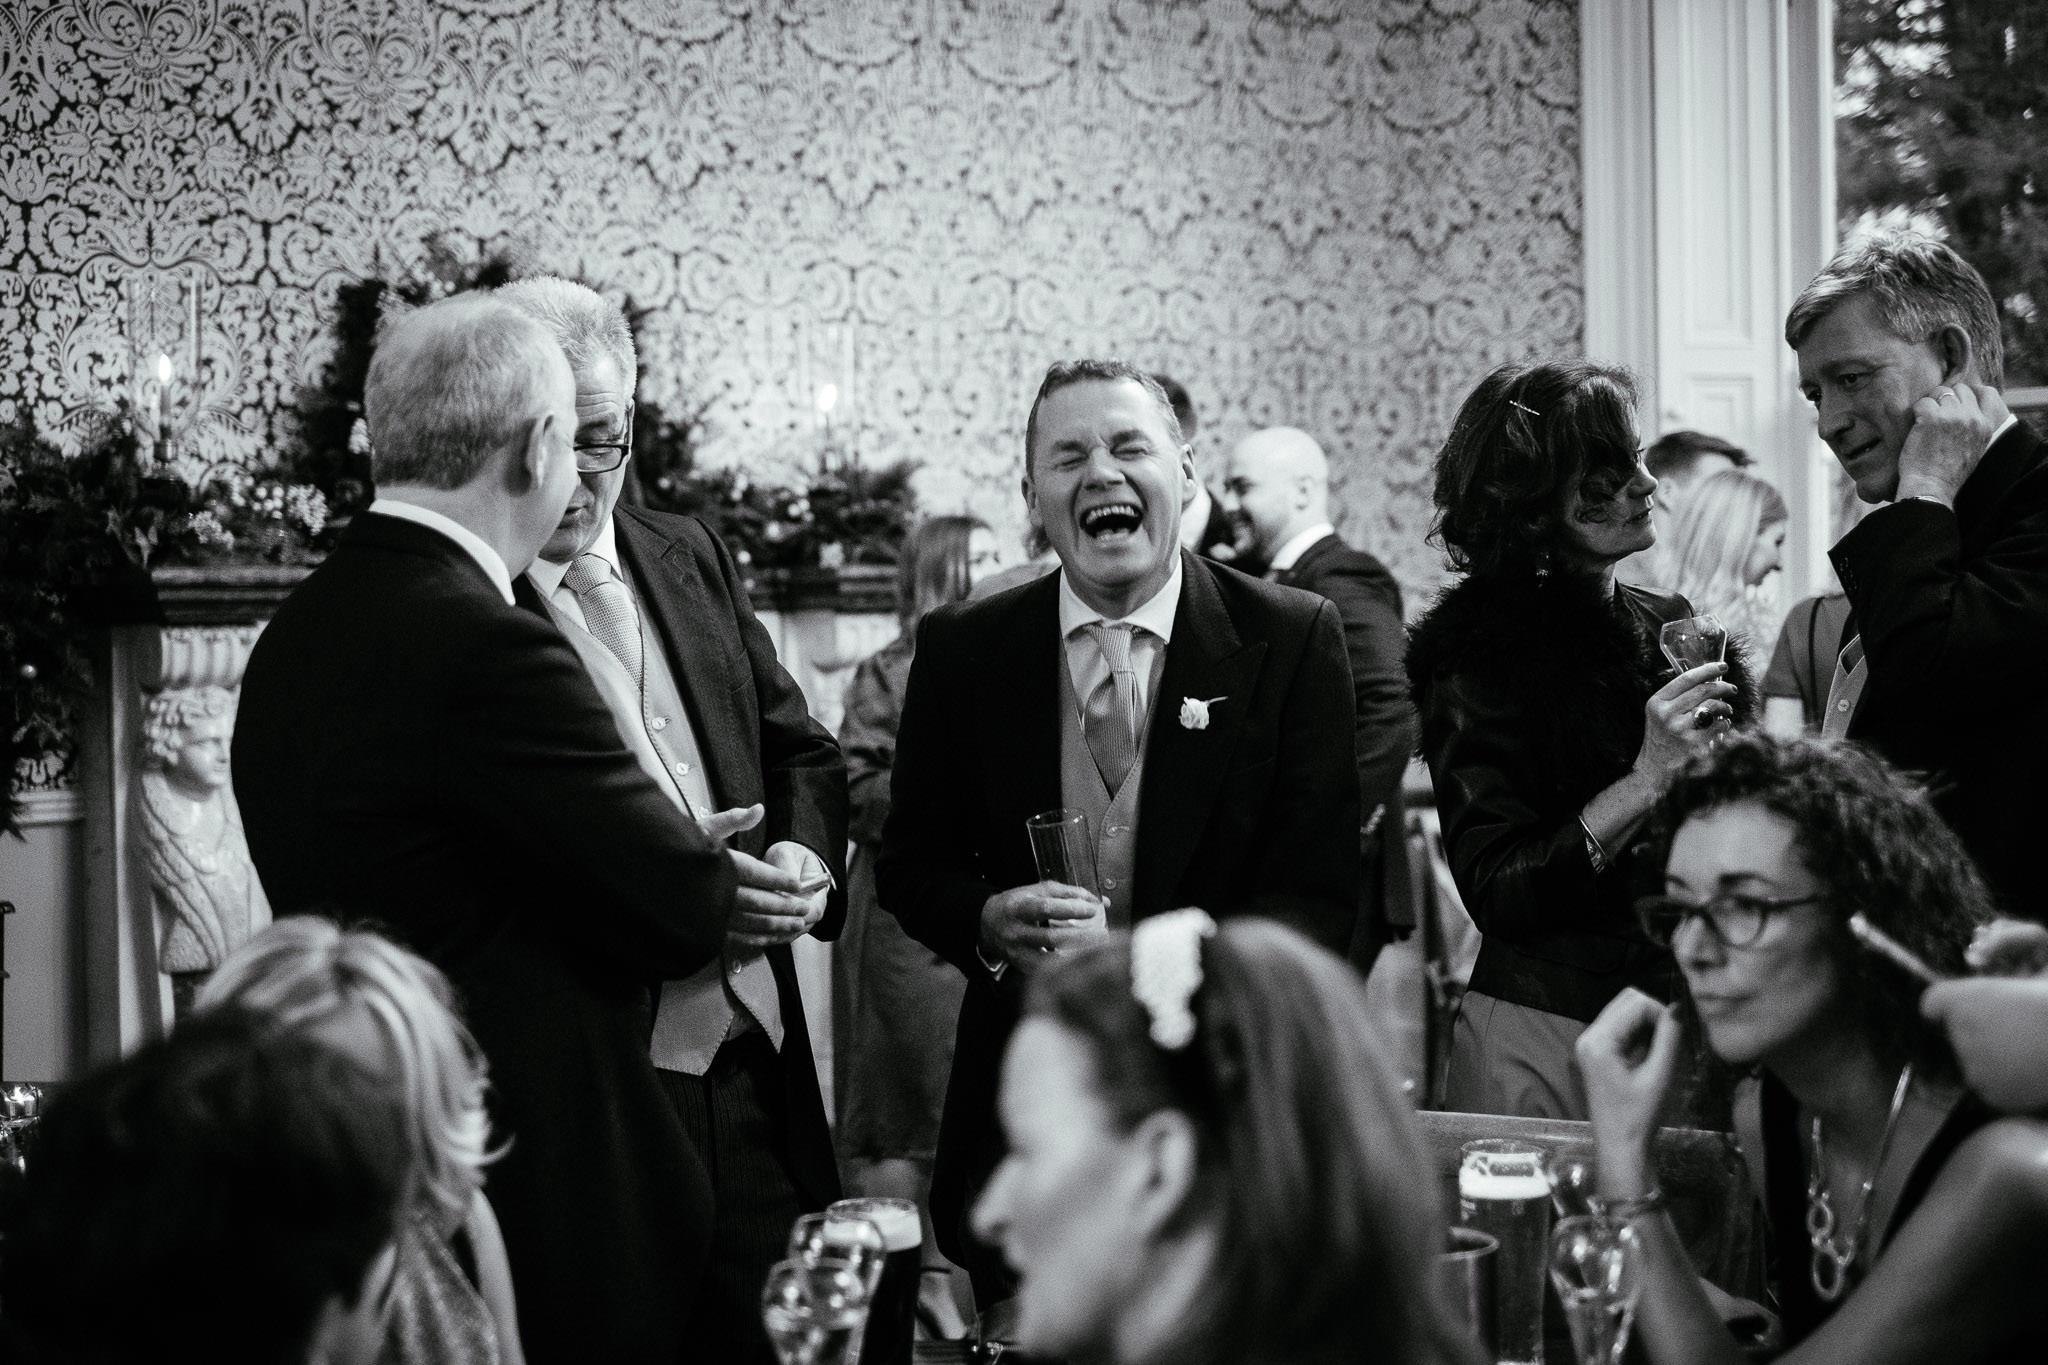 Virginia park lodge Wedding Photographer 120